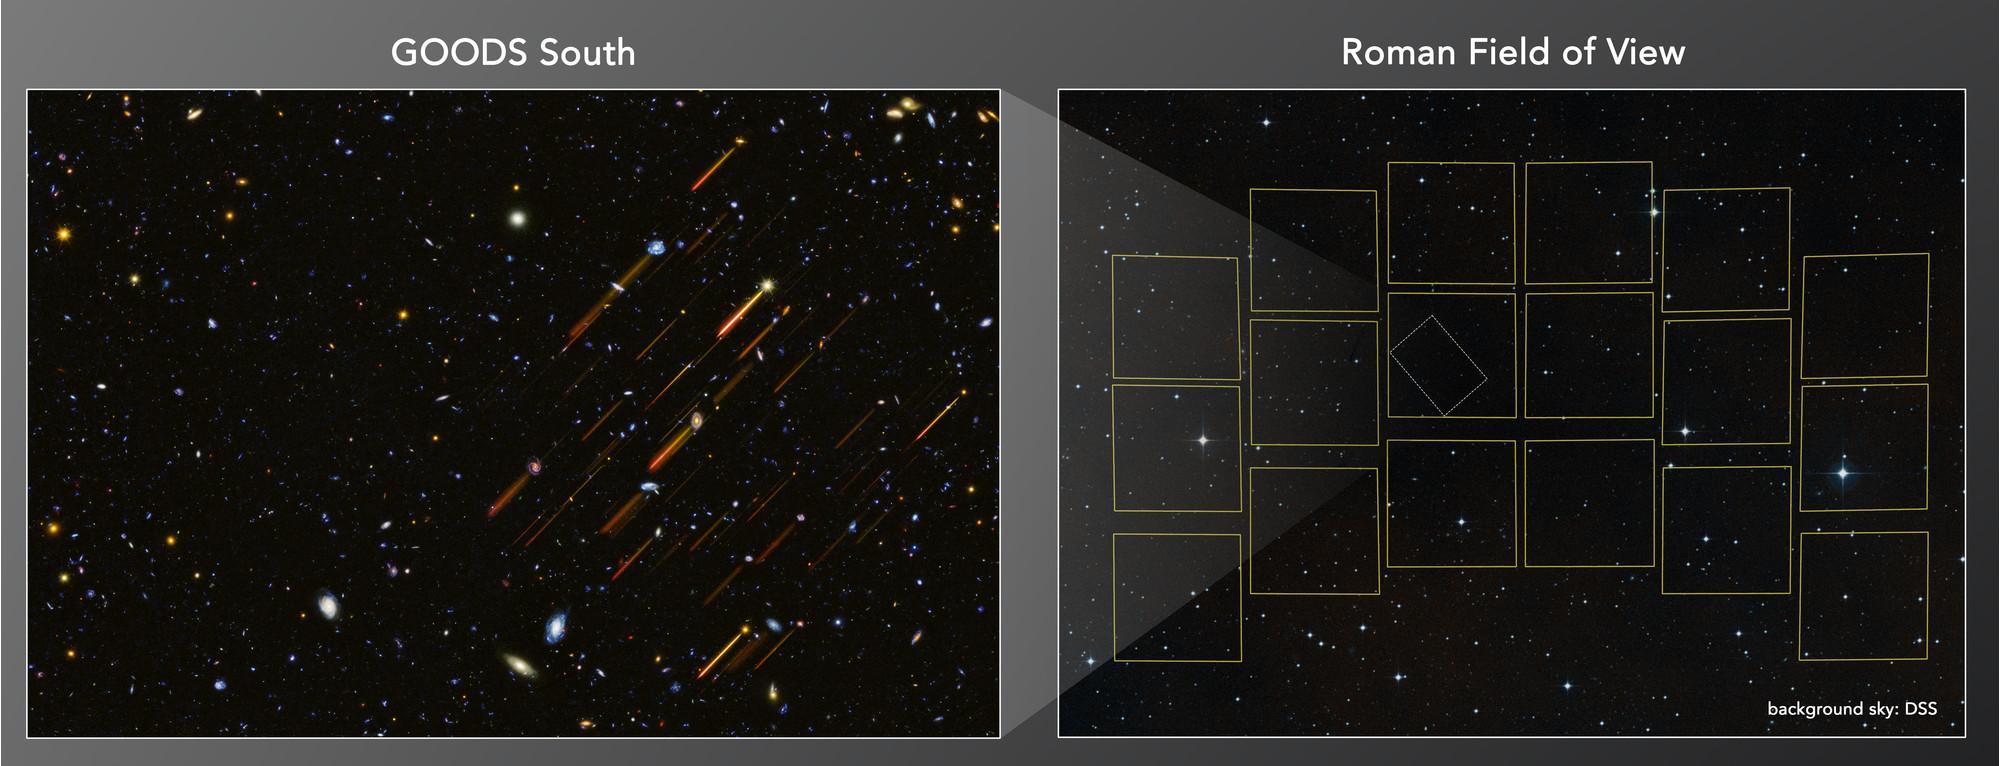 Roman Space Telescope field of view